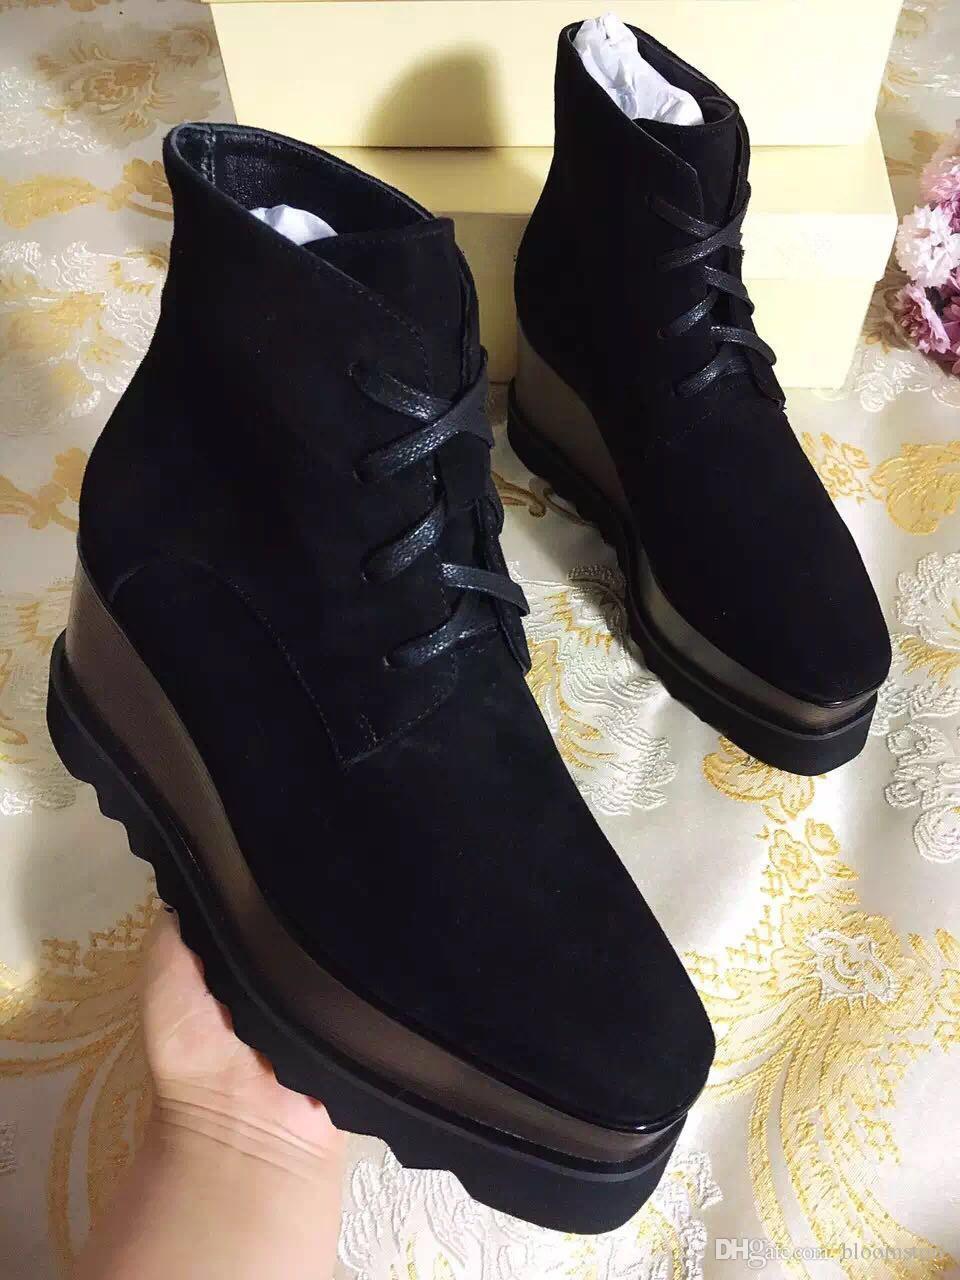 Luxus-Designer-Plattform Stiefel Damen Schuhe Elyse Sterne Wedges Top-Qualität Blingbling Leder Oxfords Schuhe 15 Farben Sneakers